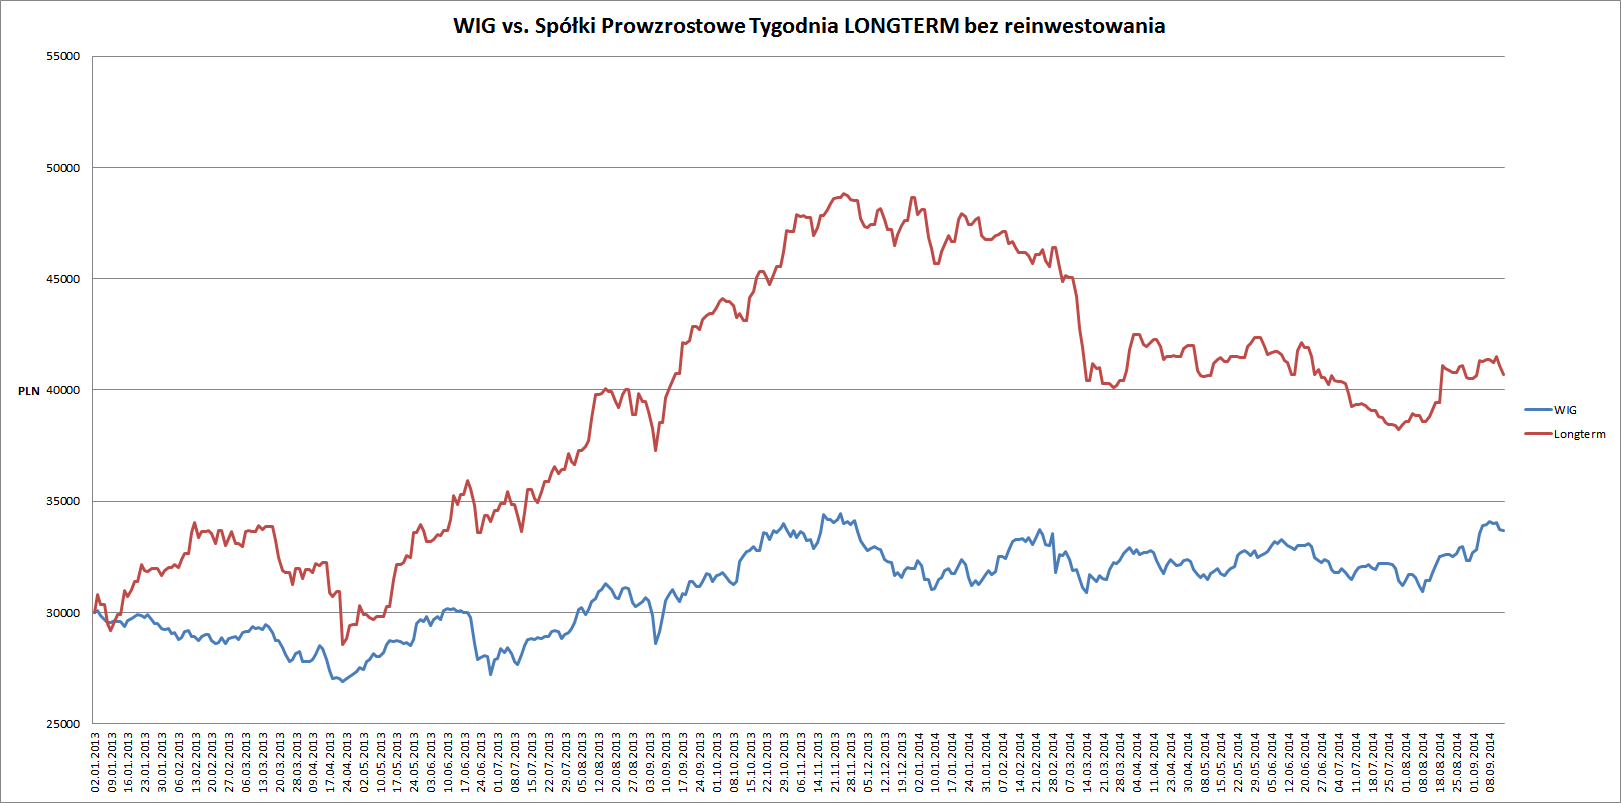 wig vs longterm 14.09.14